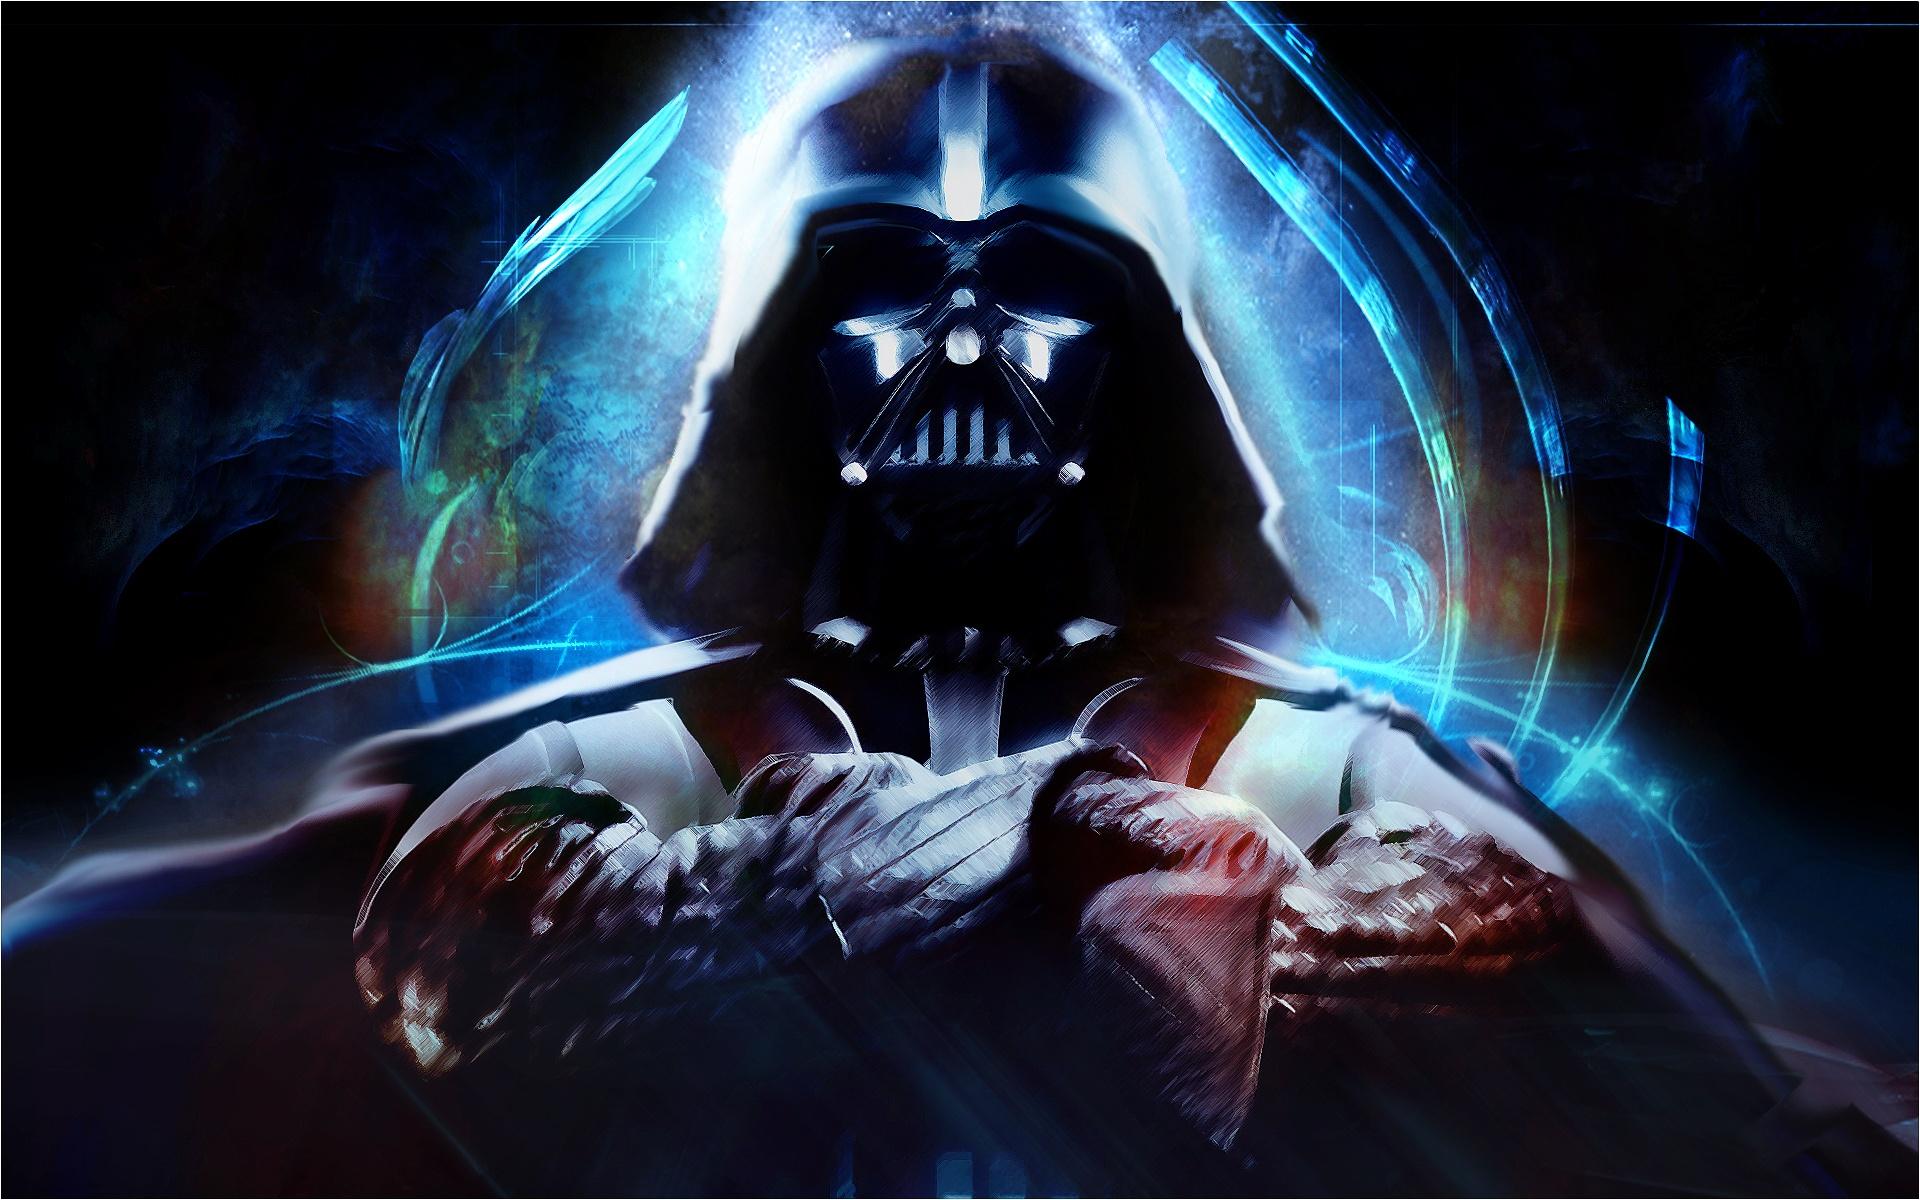 Darth Vader Star Wars HD Wallpaper   Geek Vox 1920x1200